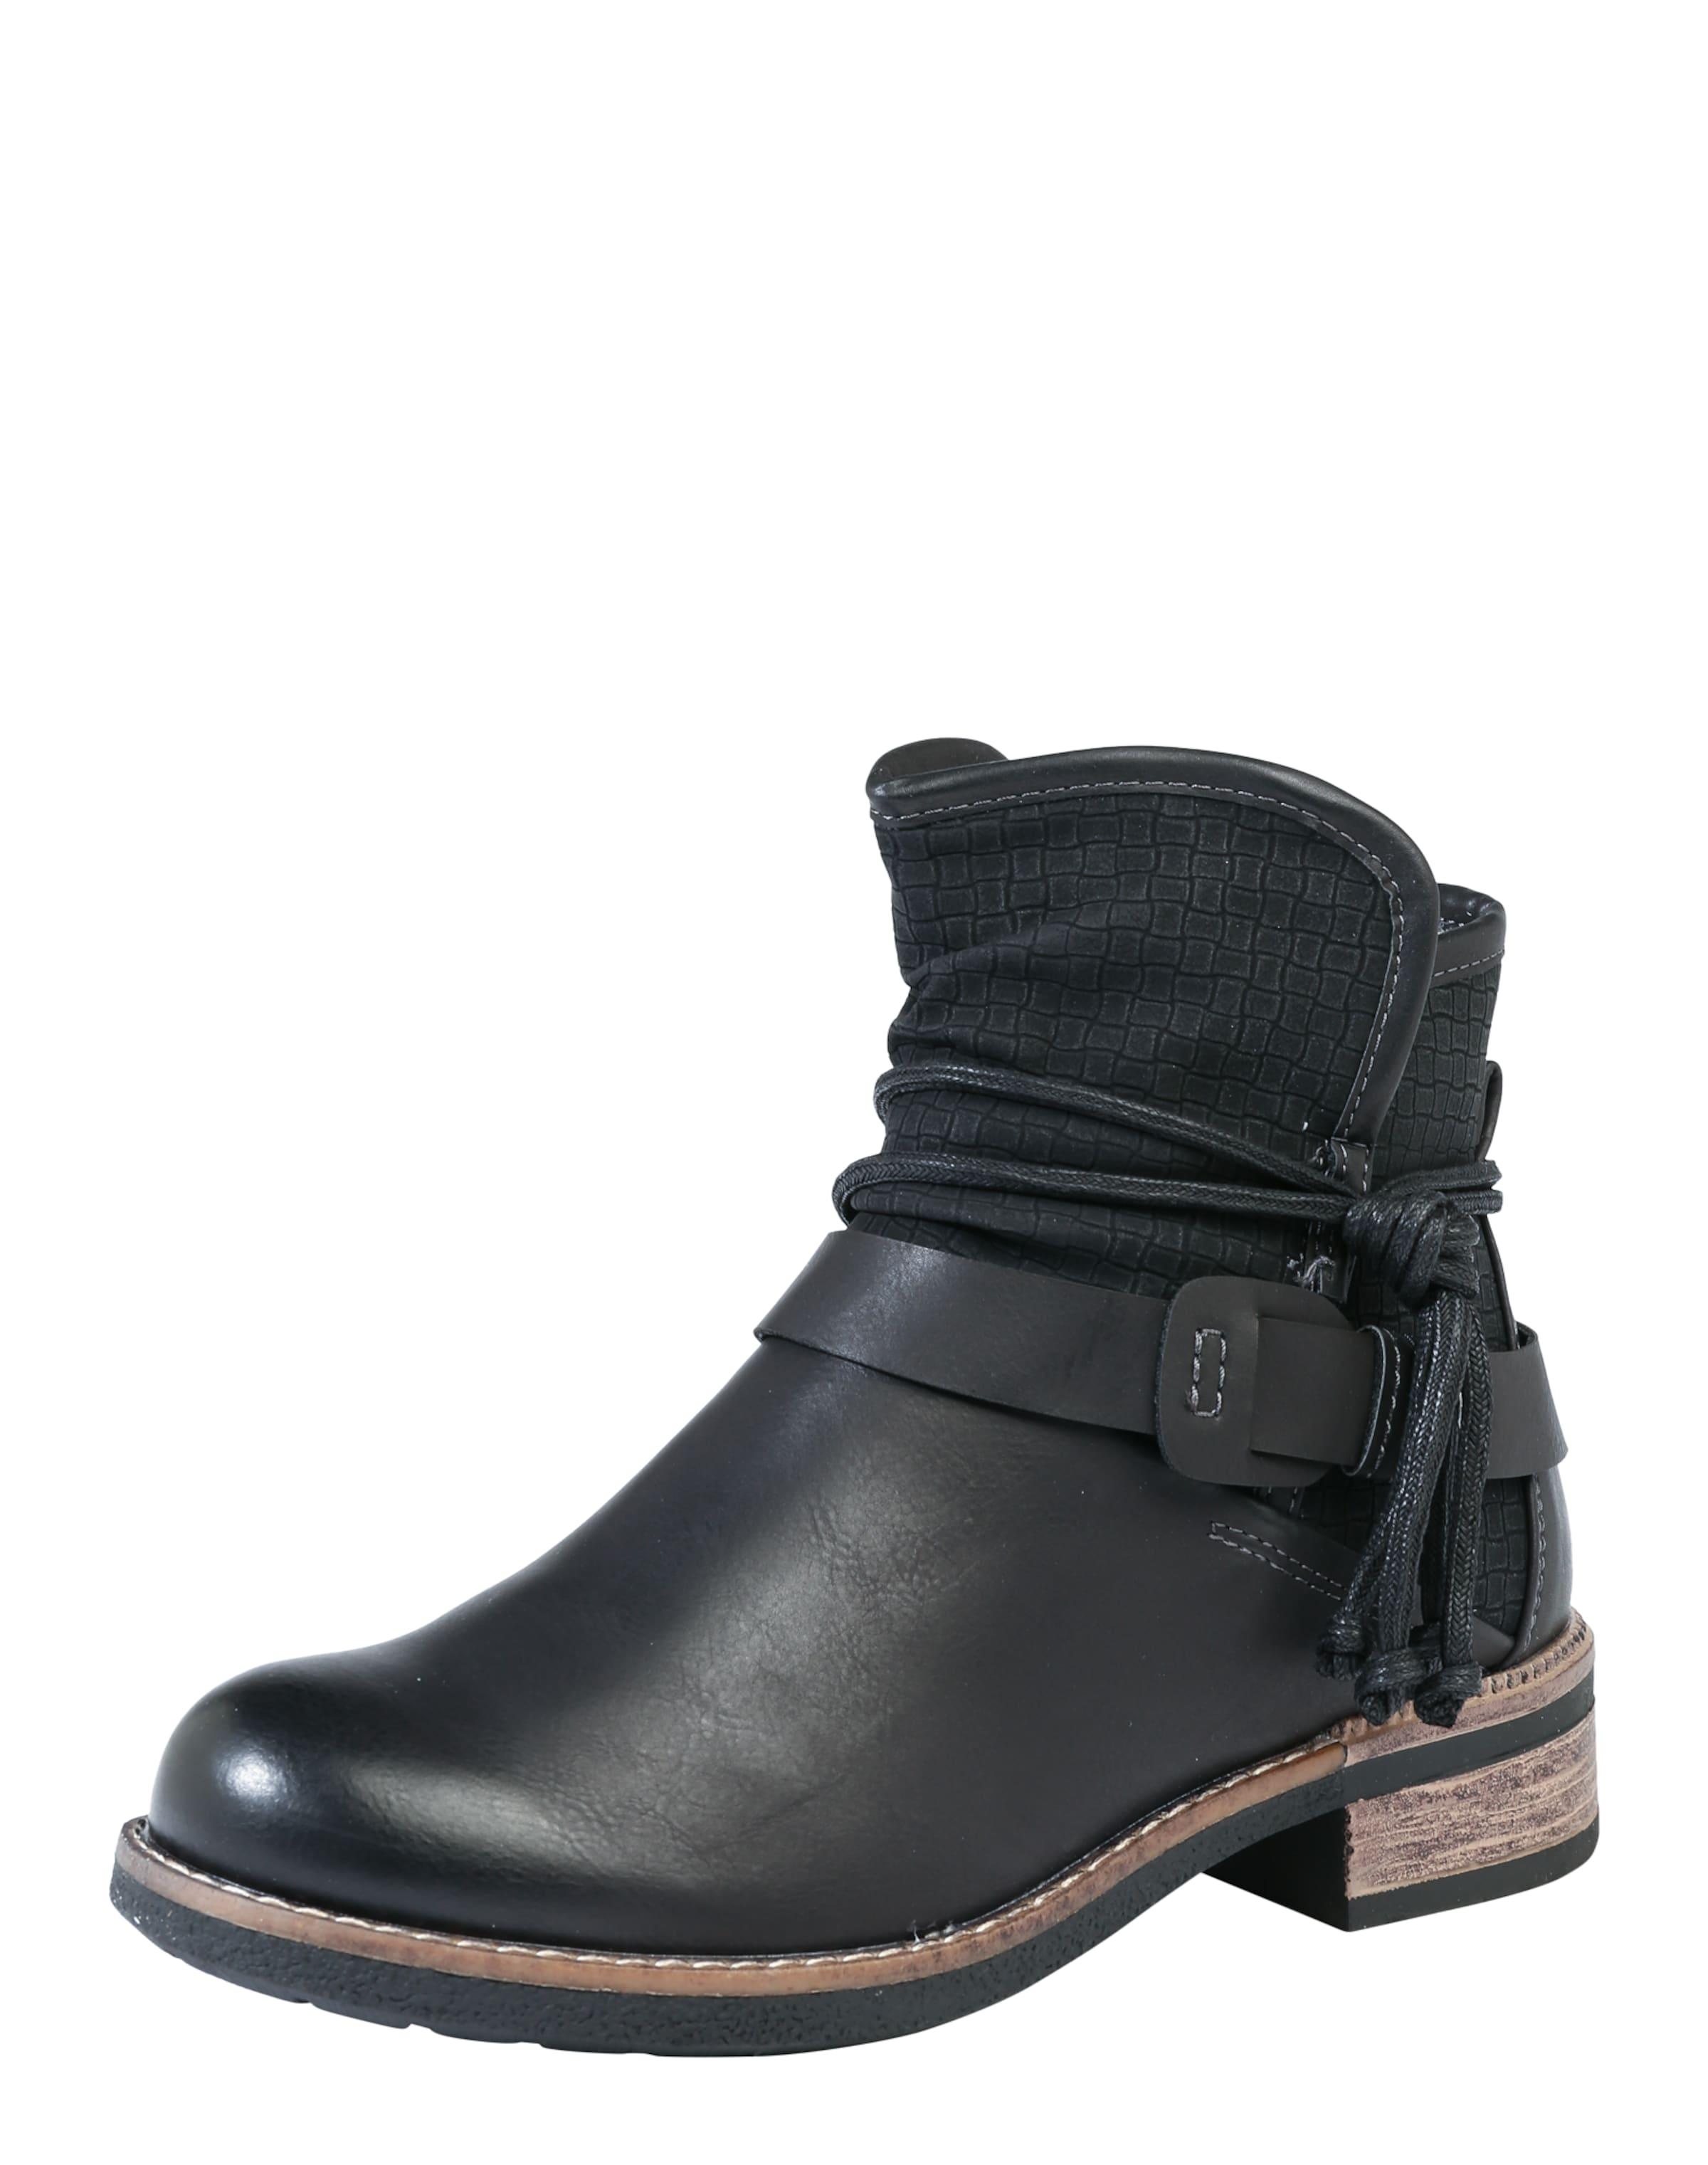 Haltbare Mode billige Schuhe RIEKER   Stiefelette in Leder-Optik Schuhe Gut getragene Schuhe